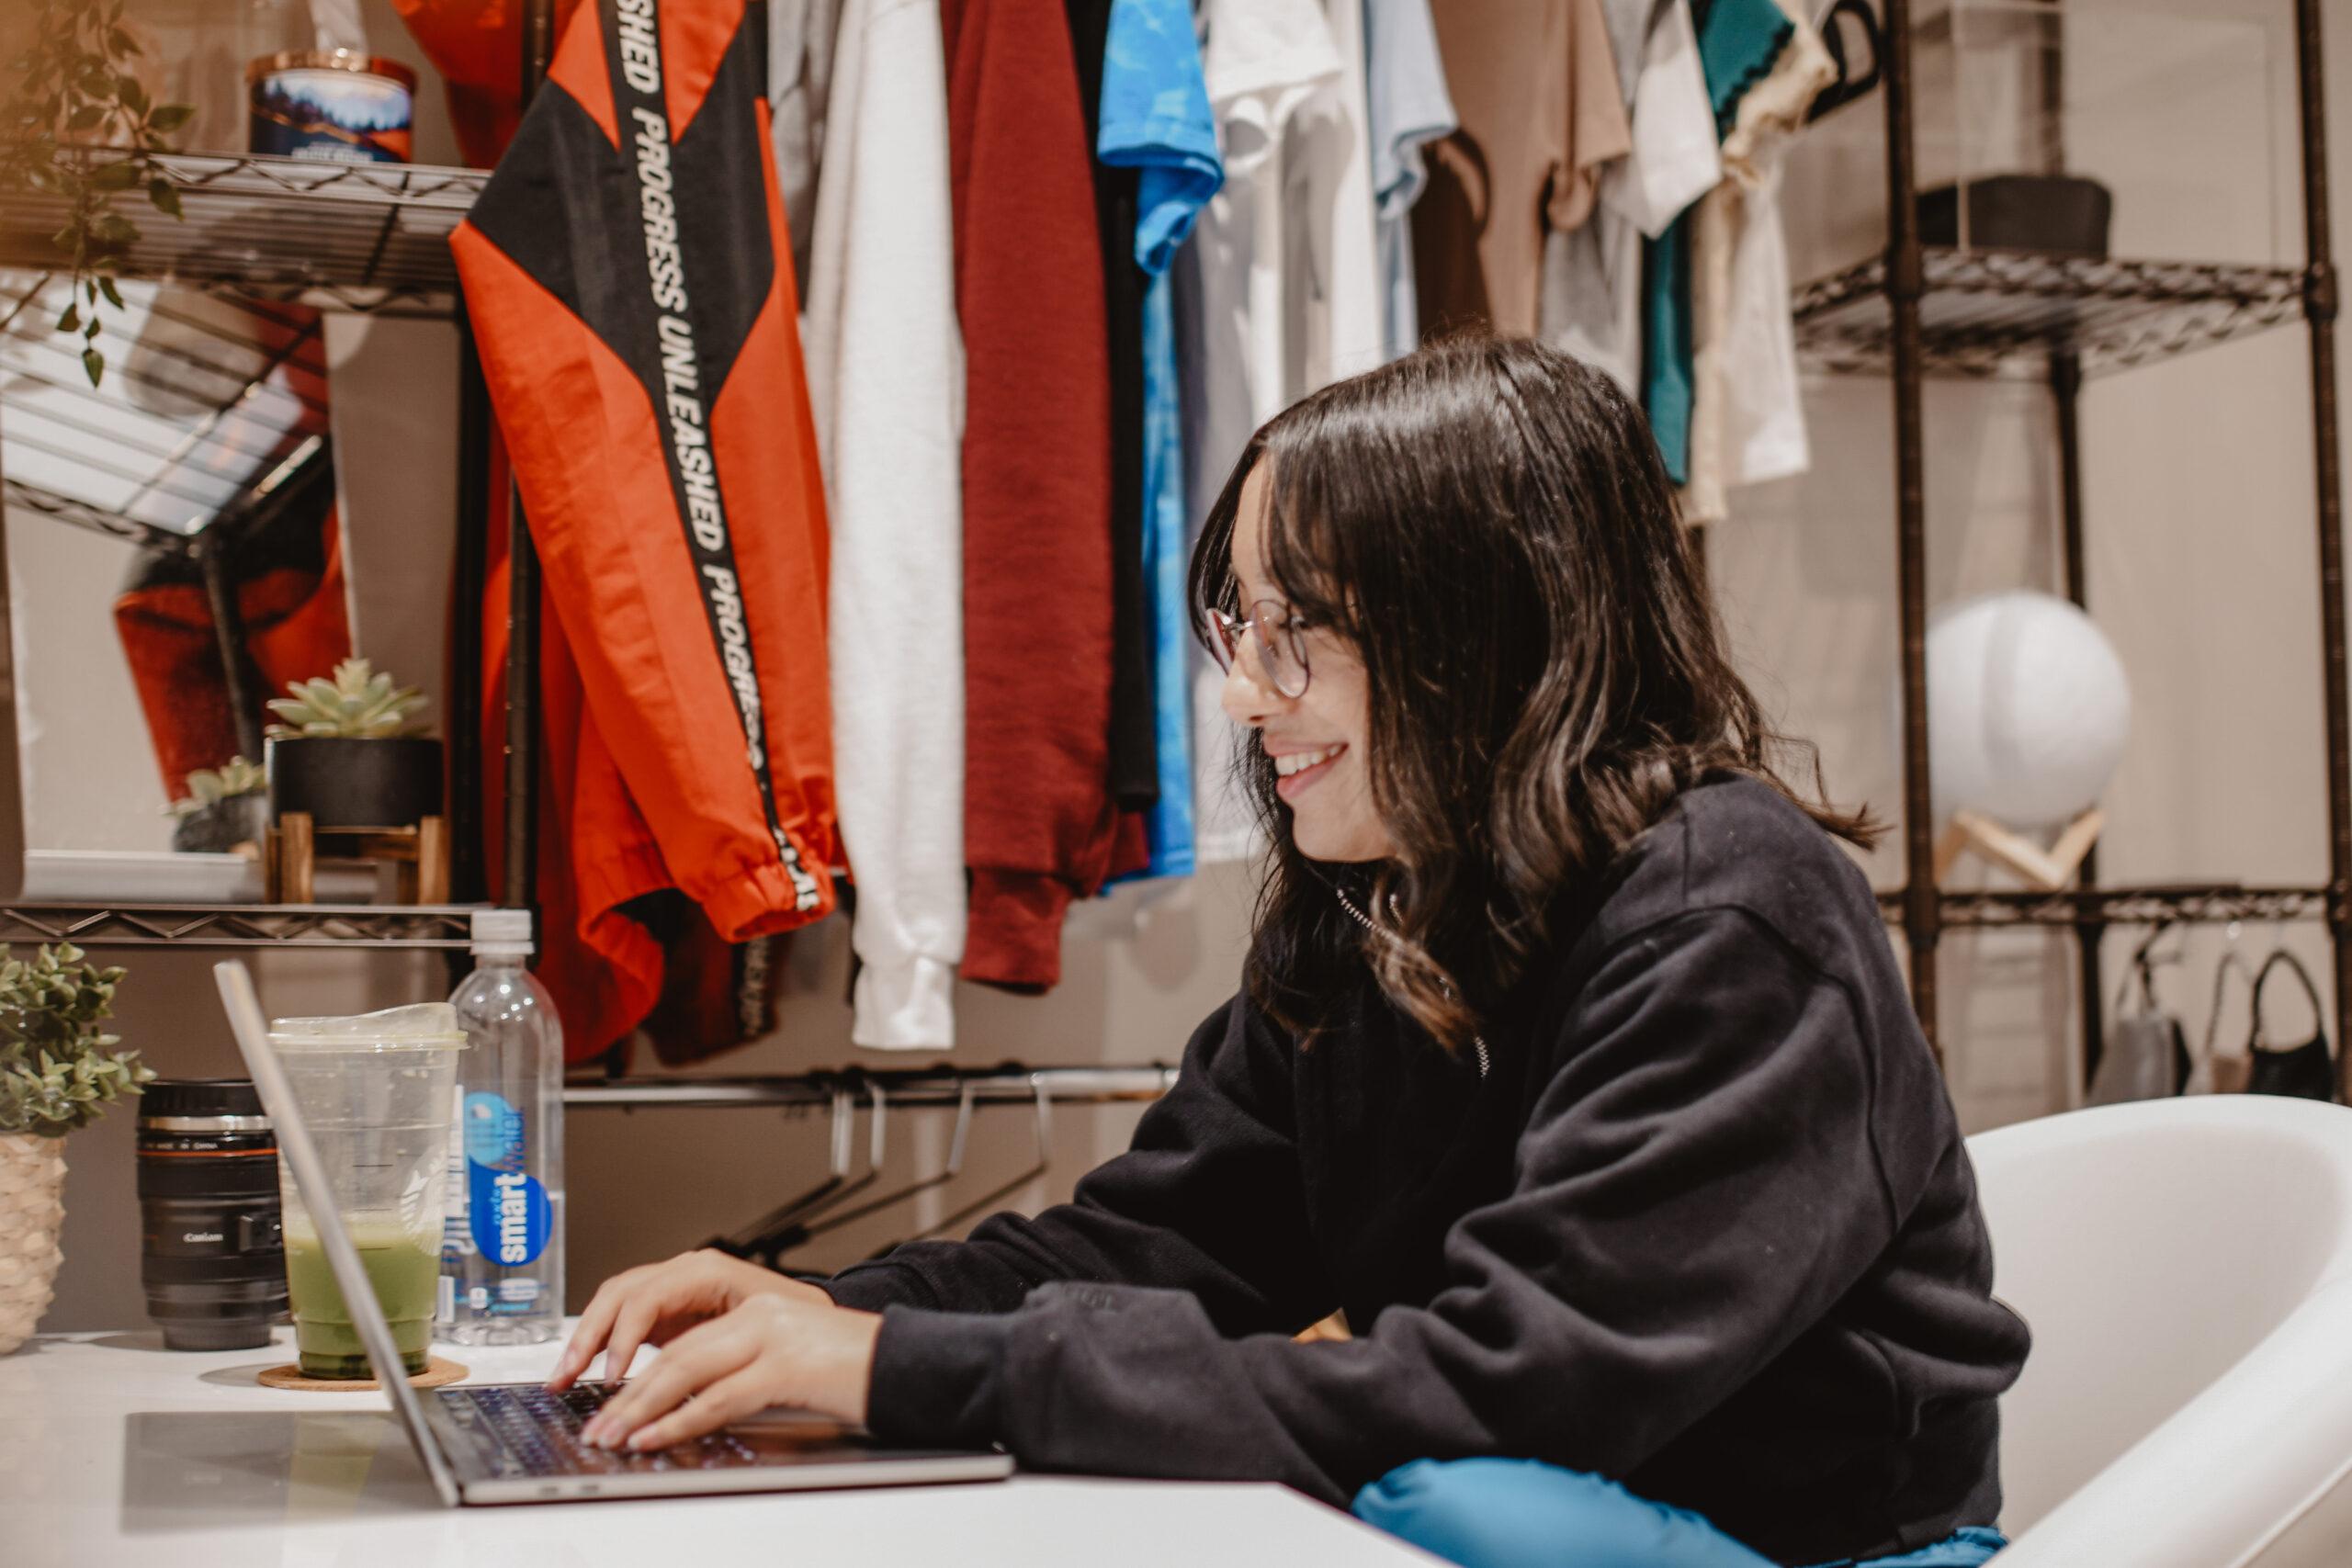 Photo depicting Narissa Horning working at a laptop